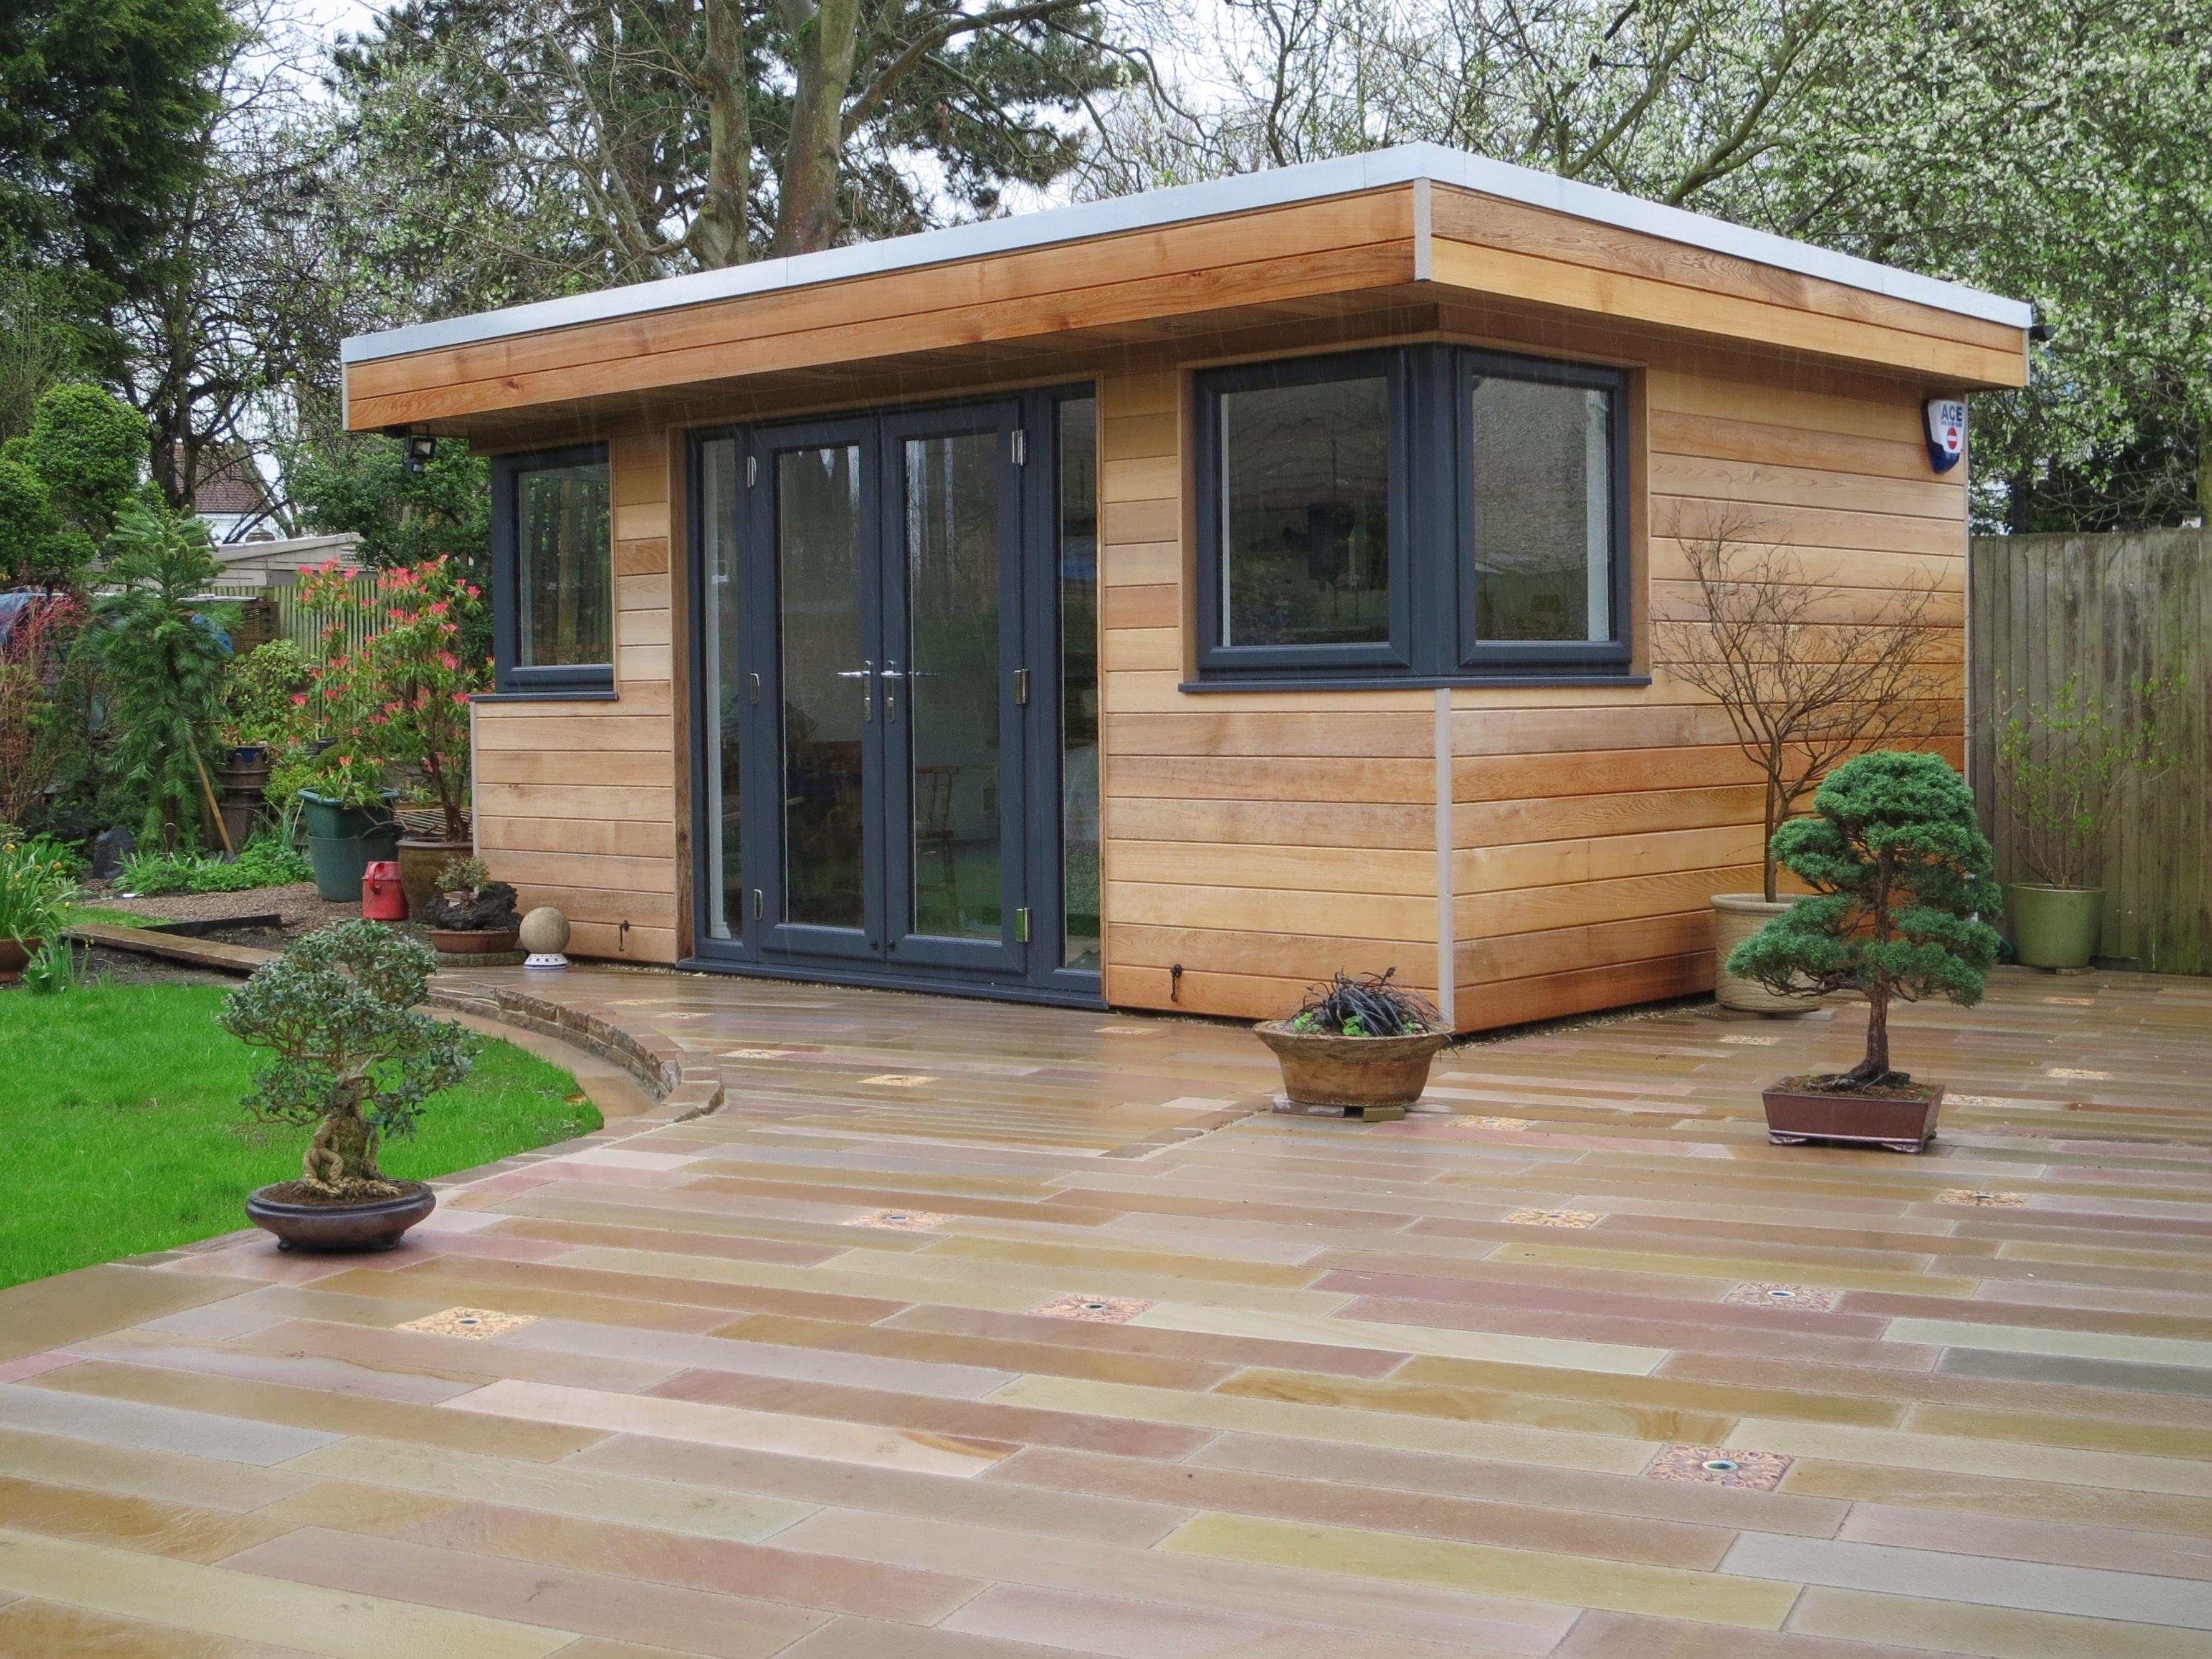 A beautifully clad garden room in Western Red Cedar built